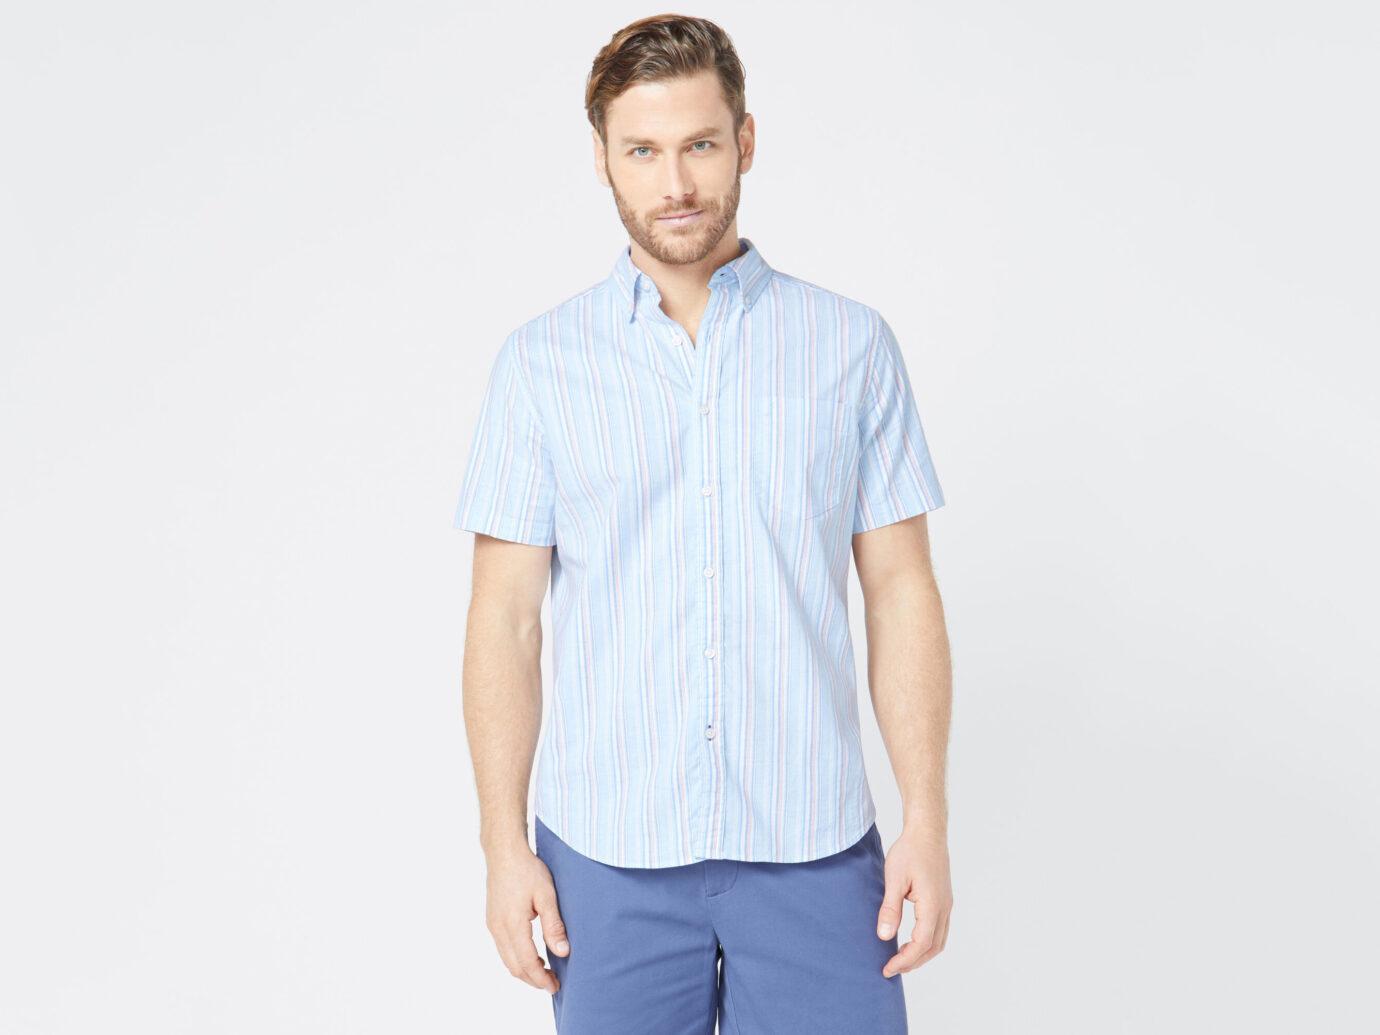 Nautica Men's Classic Fit Striped Oxford Shirt